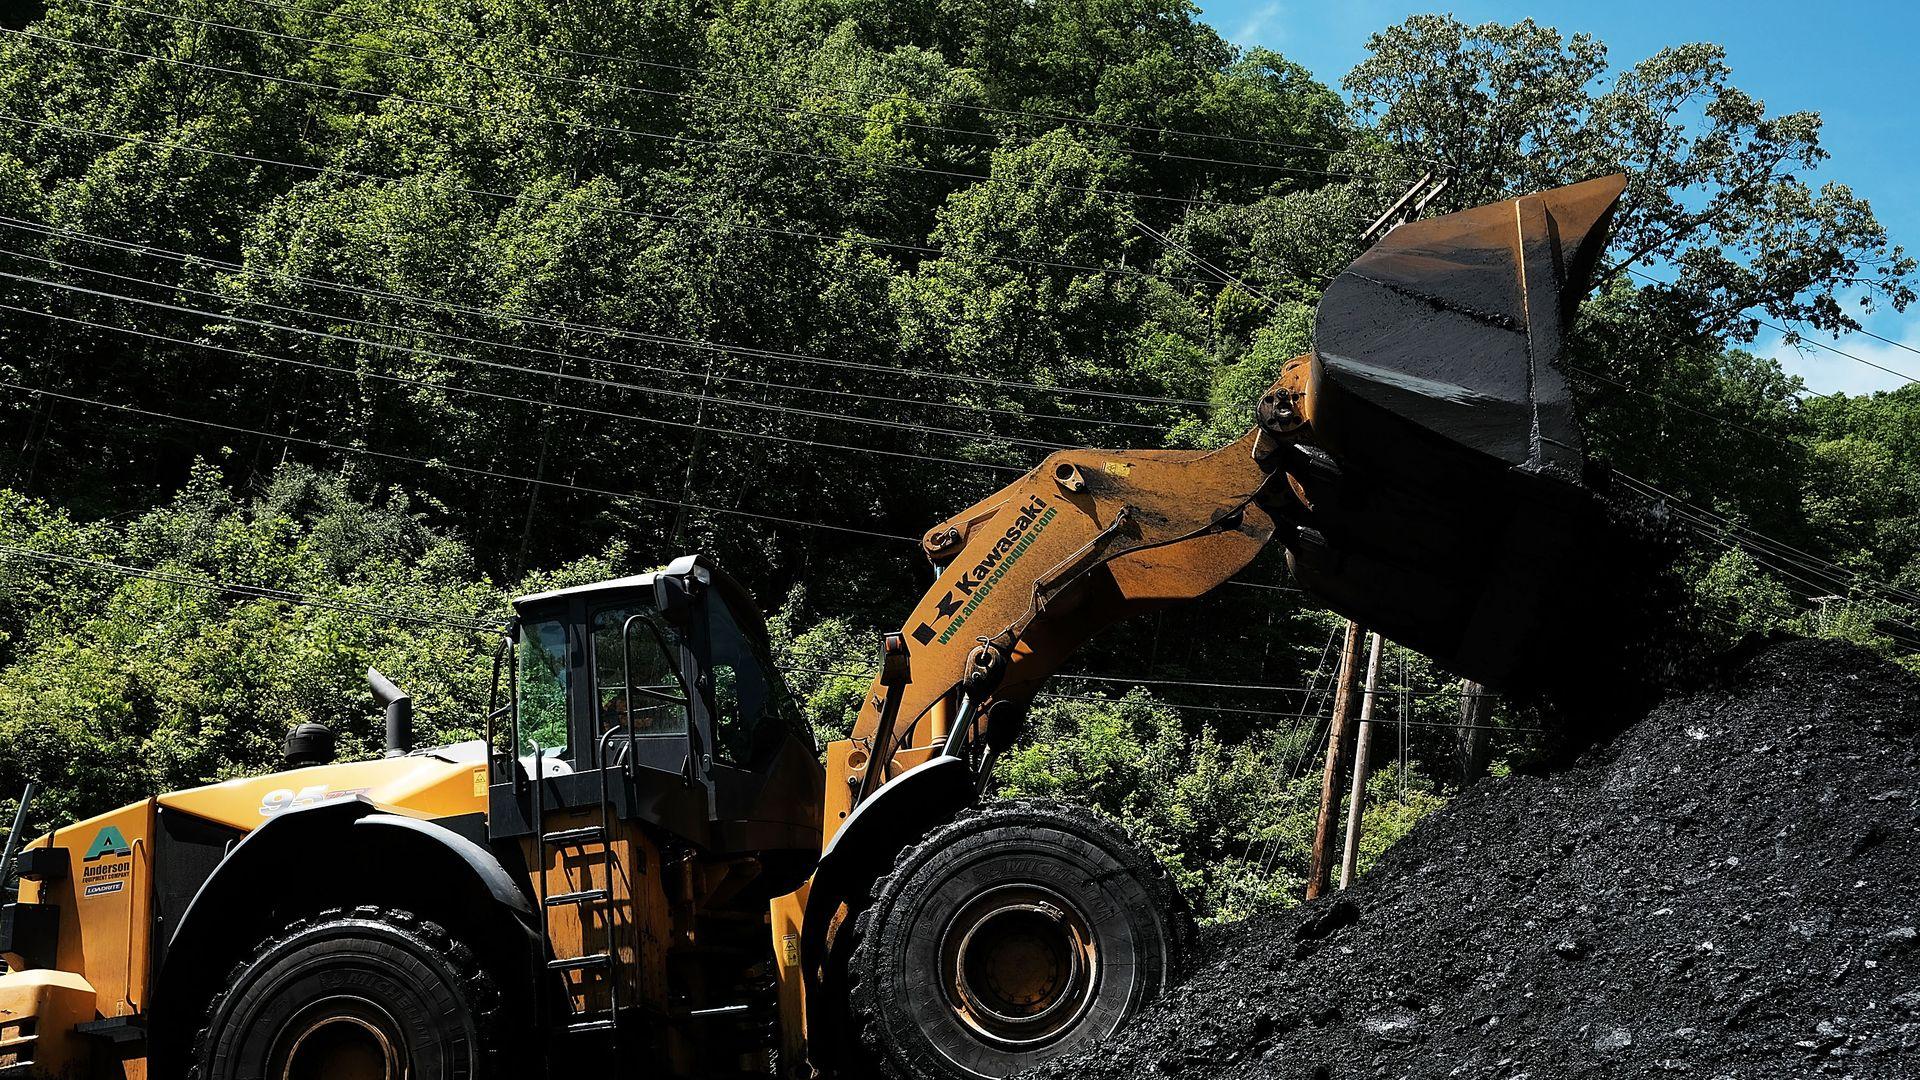 A tractor at a coal plant